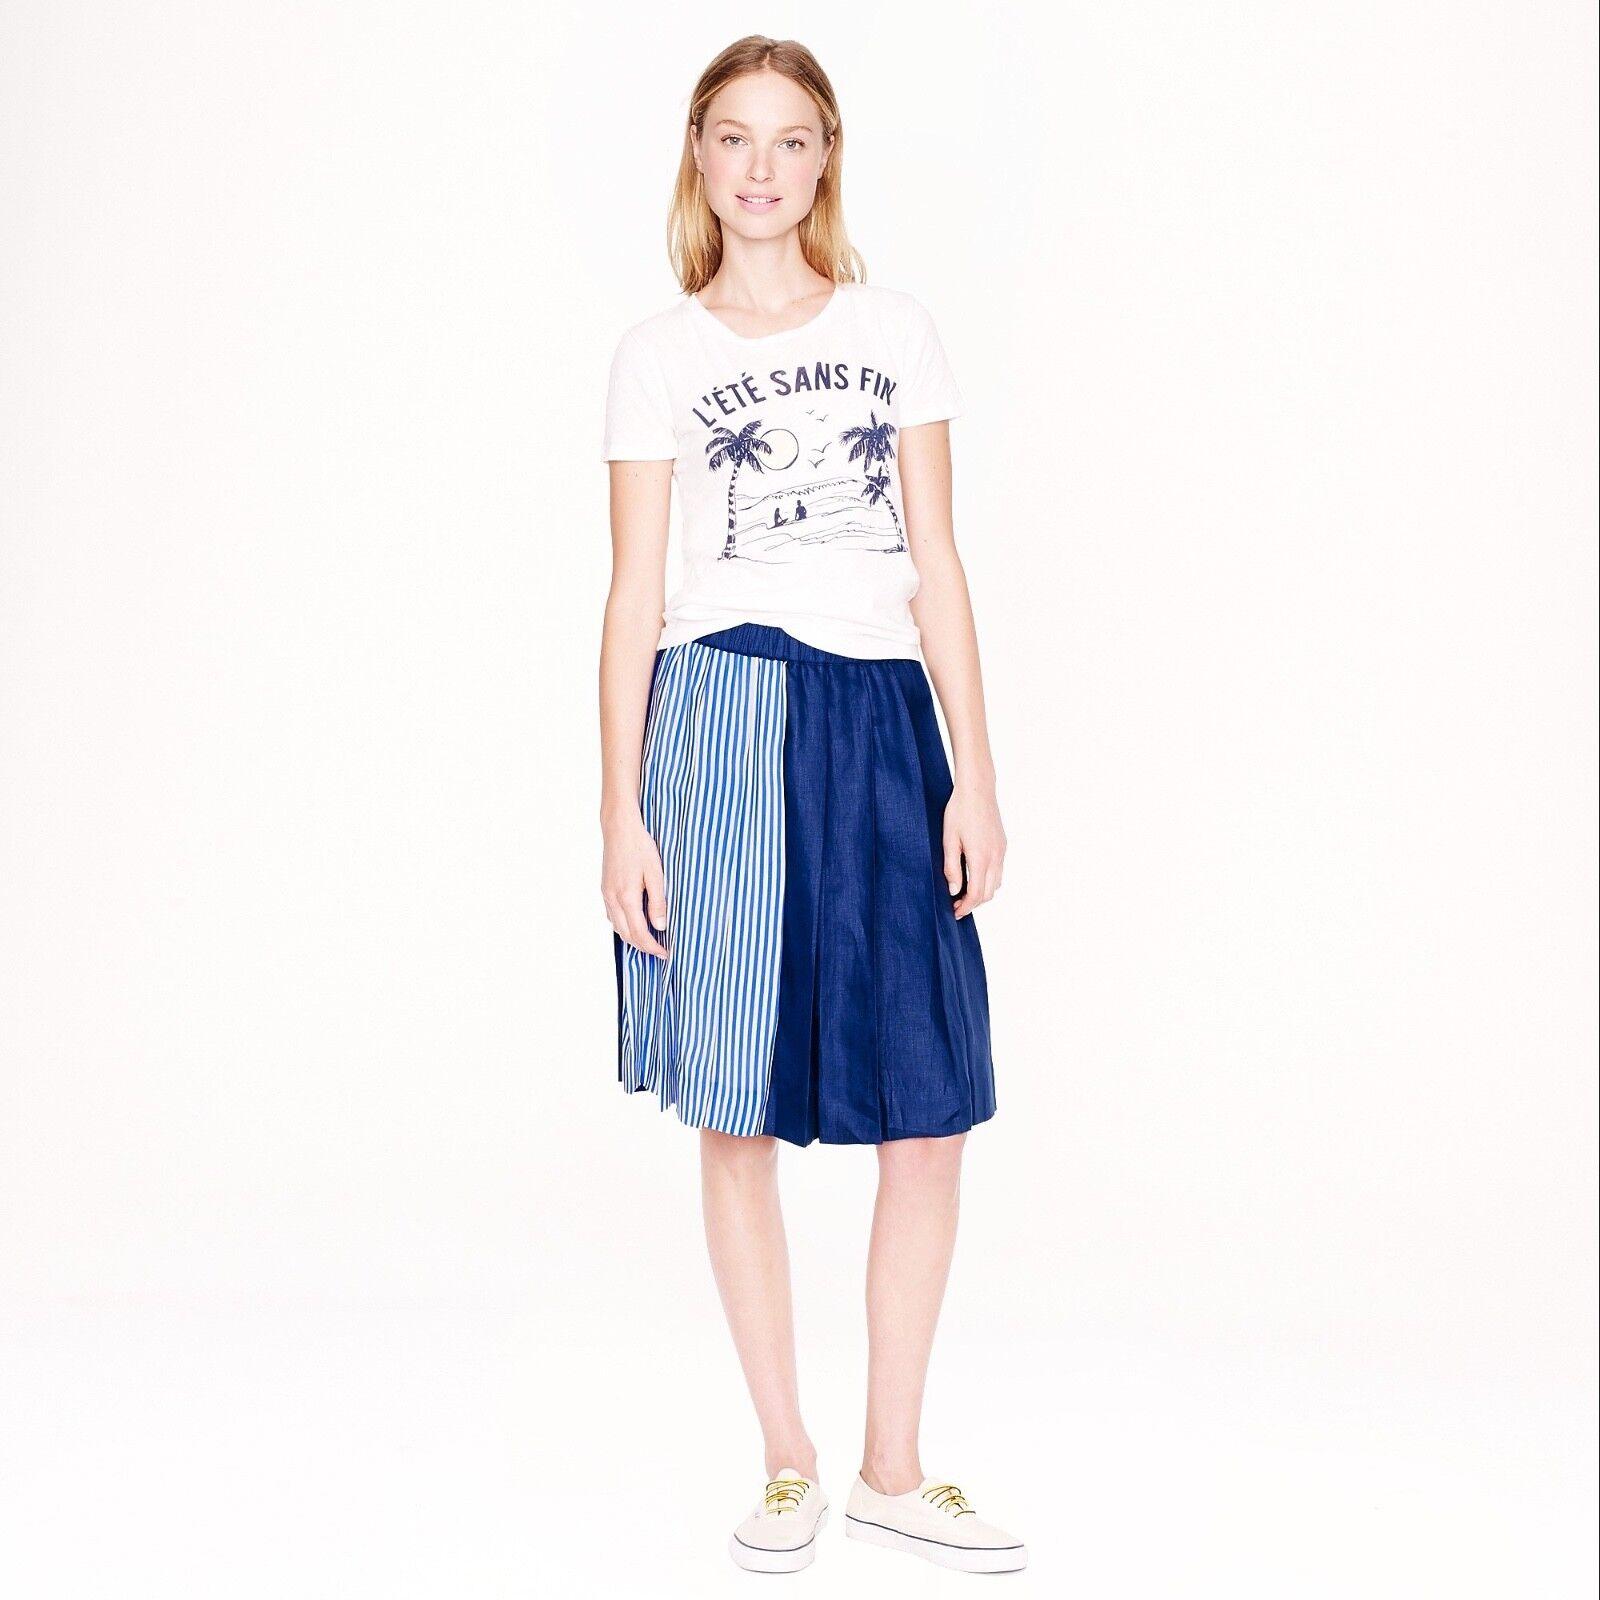 NWT J CREW COLLECTION  stripe mix skirt, Größe 4,  168